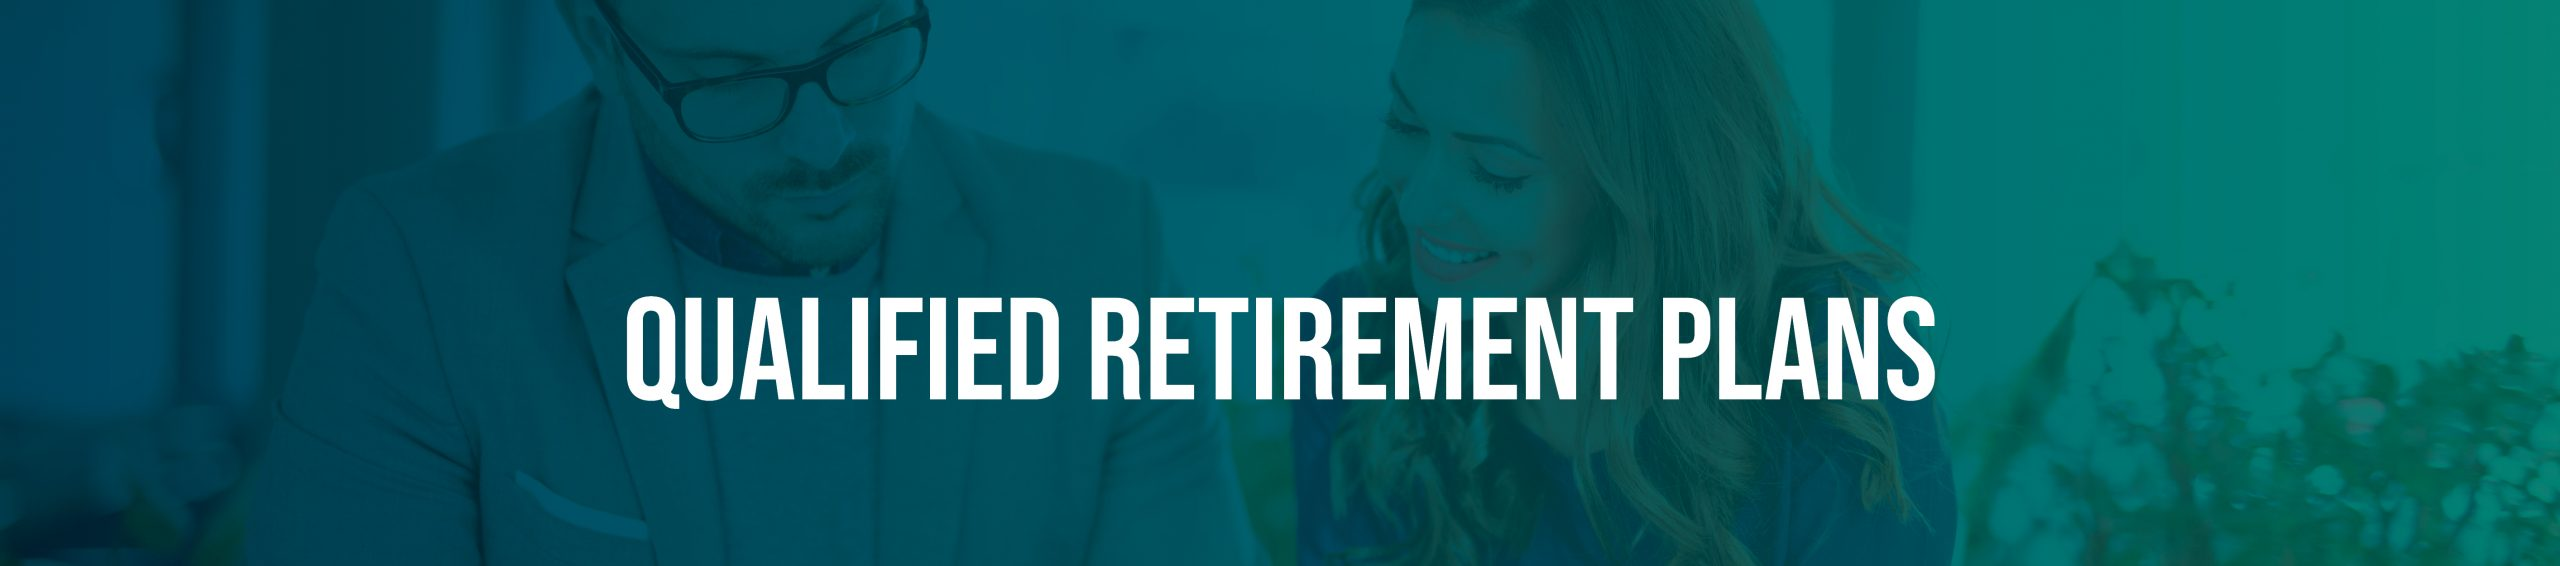 Qualified Retirement Plans